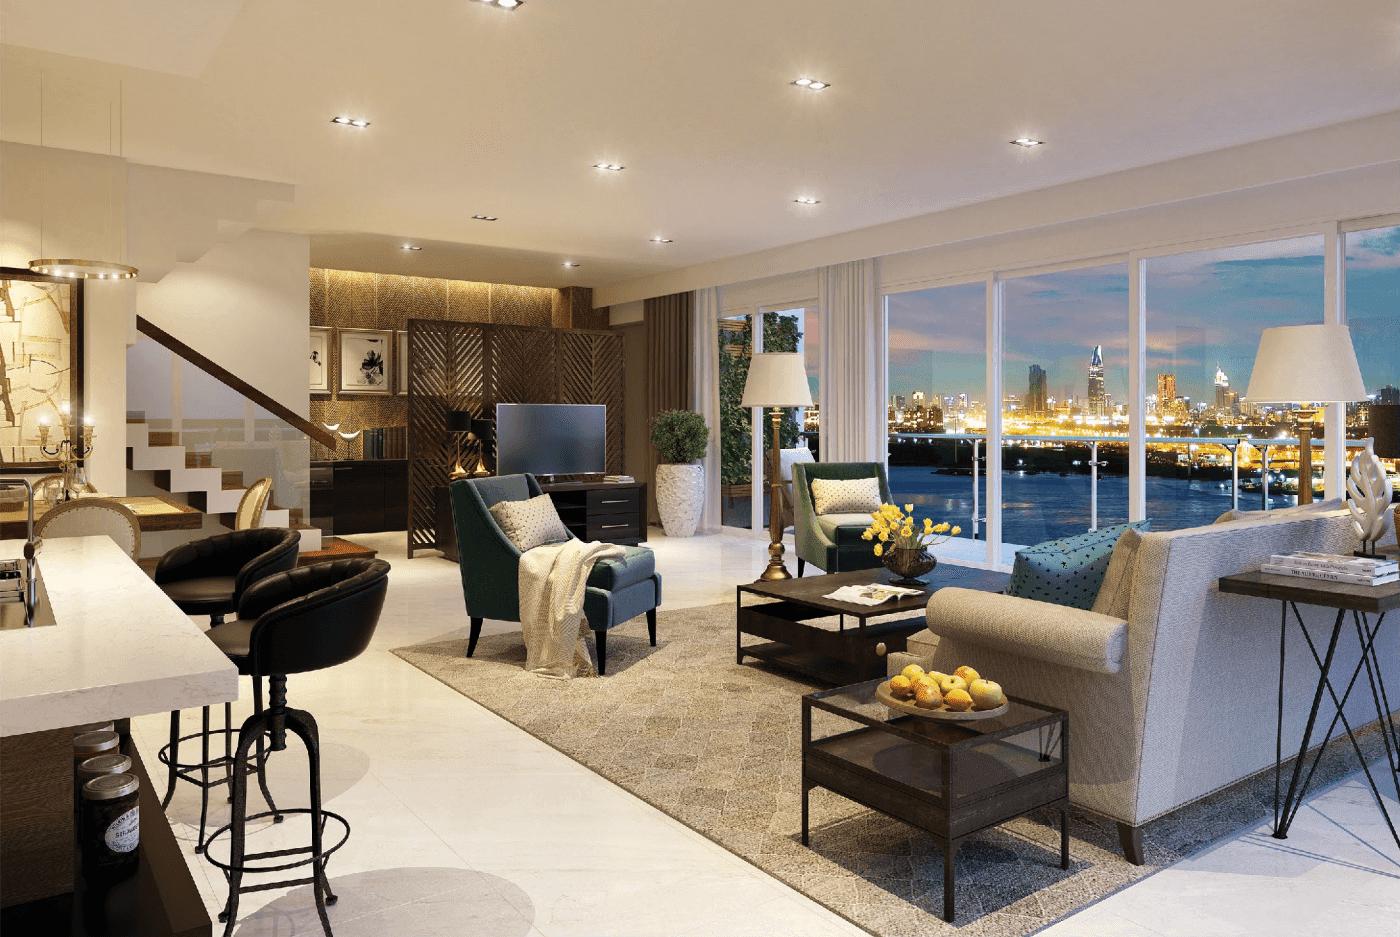 bán căn hộ tháp brilliant dự án đảo kim cương